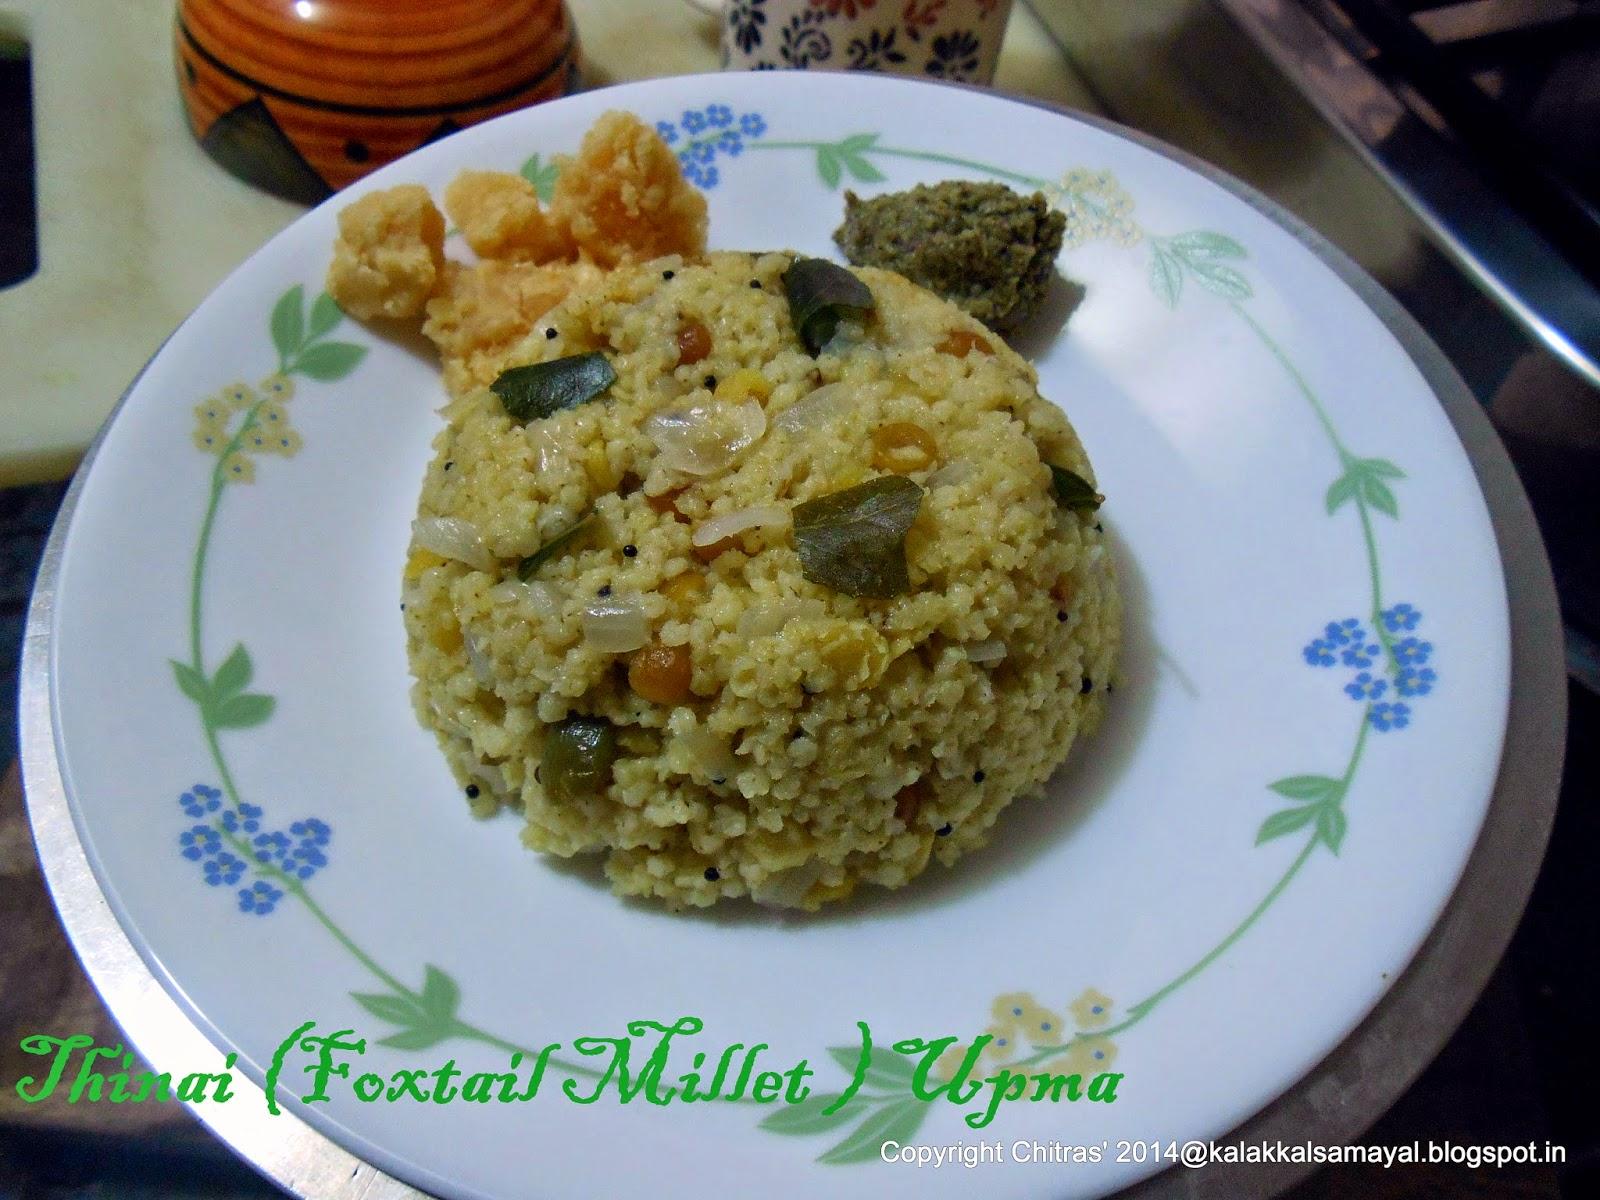 Thinai [ foxtail millet ] Upma